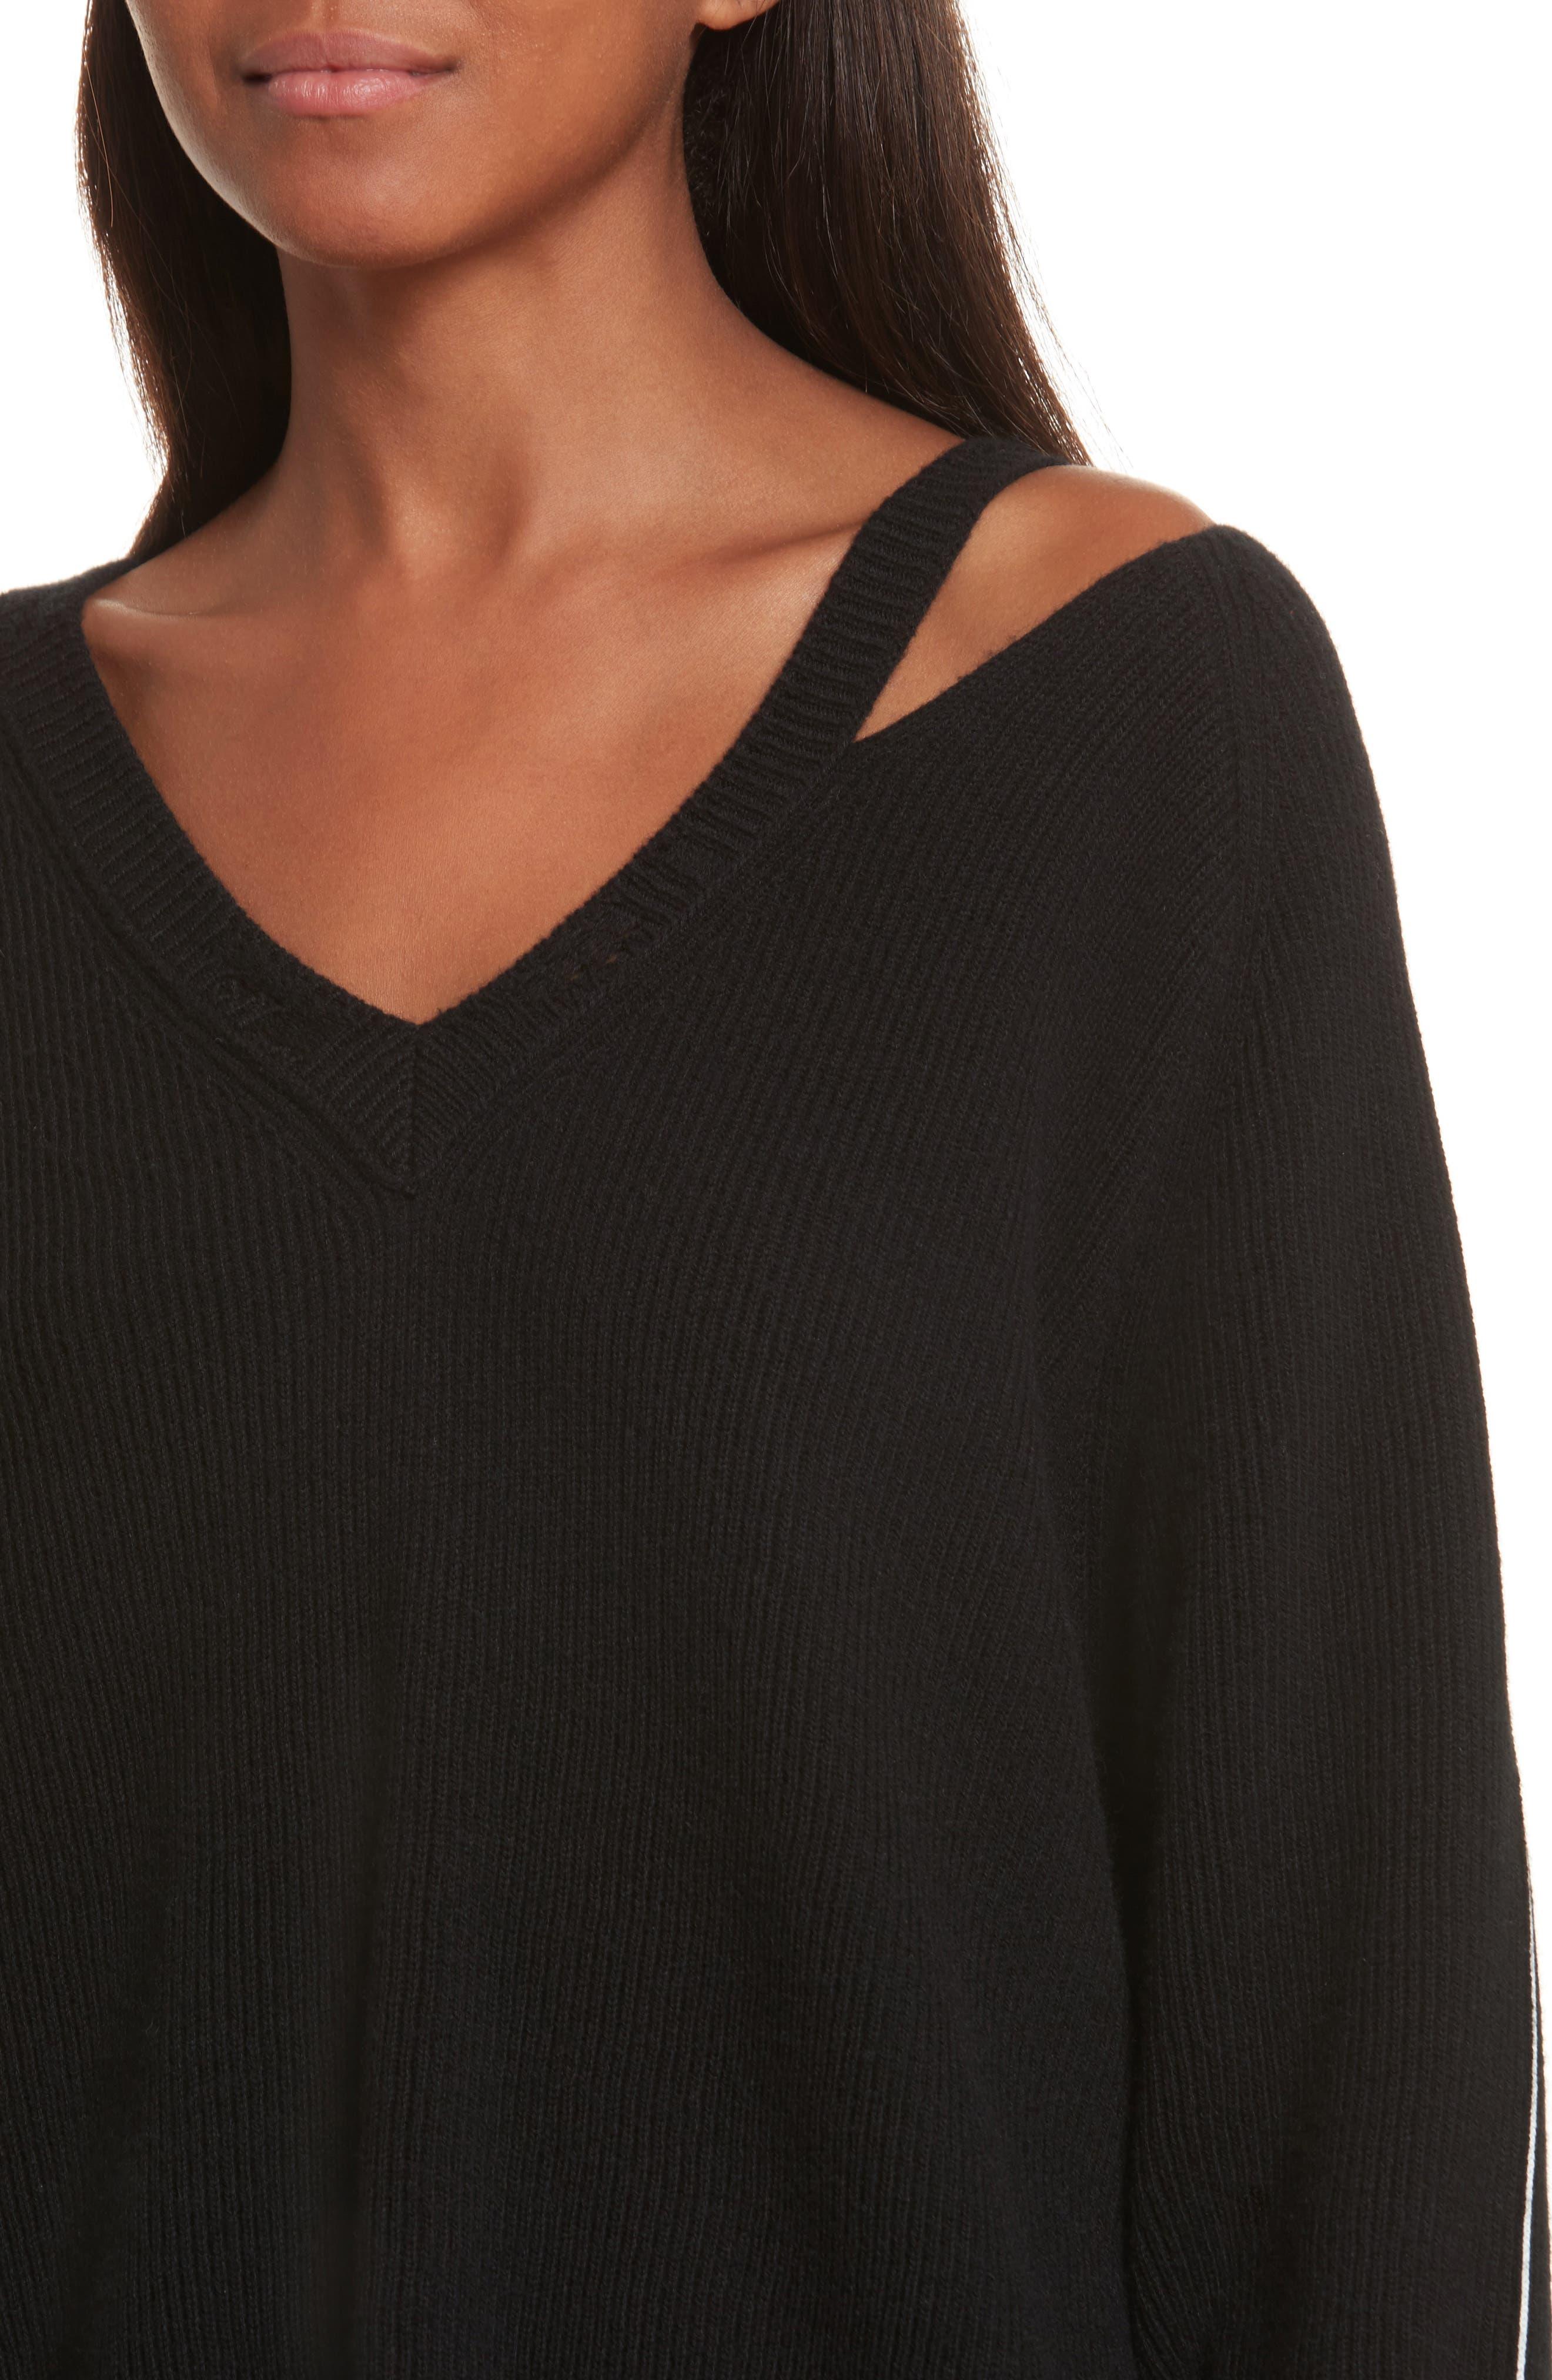 Distressed V-Neck Sweater,                             Alternate thumbnail 4, color,                             Black